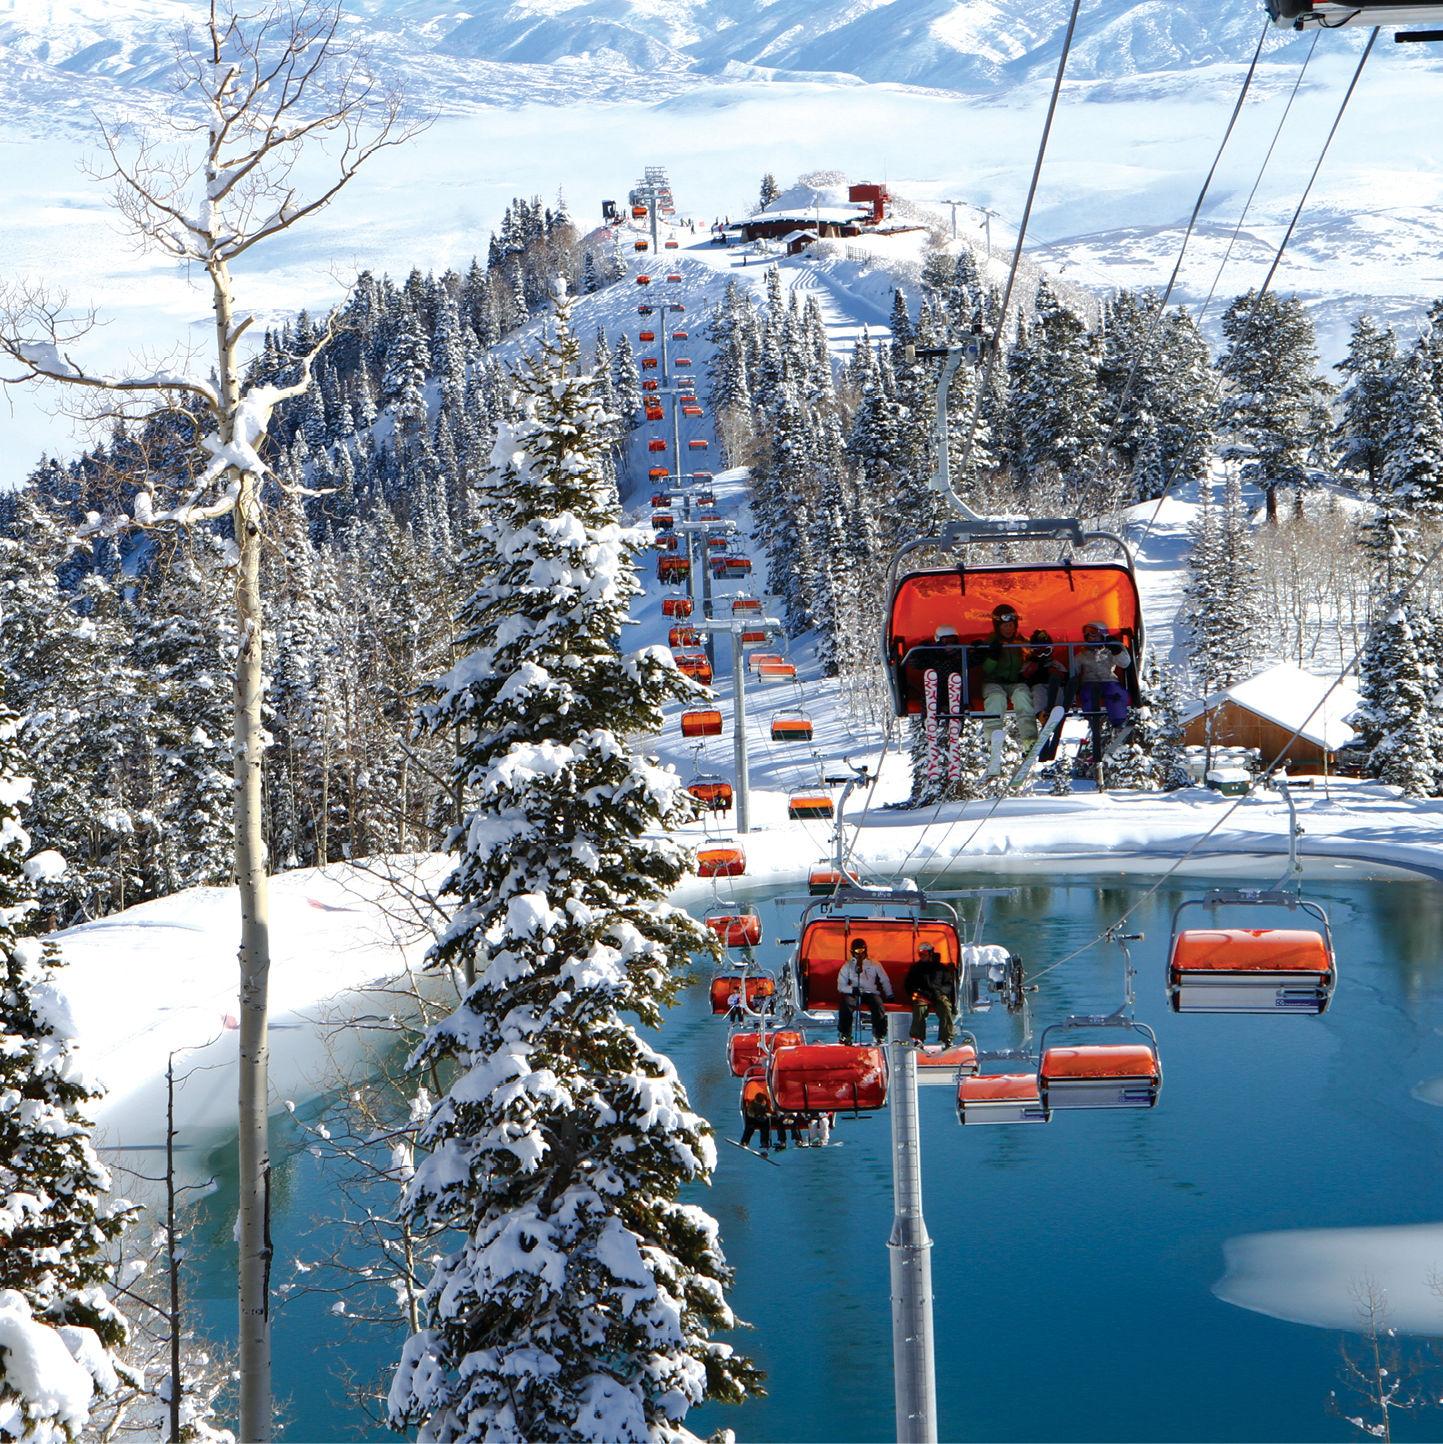 1217 mountain time park city skilift owfvdq